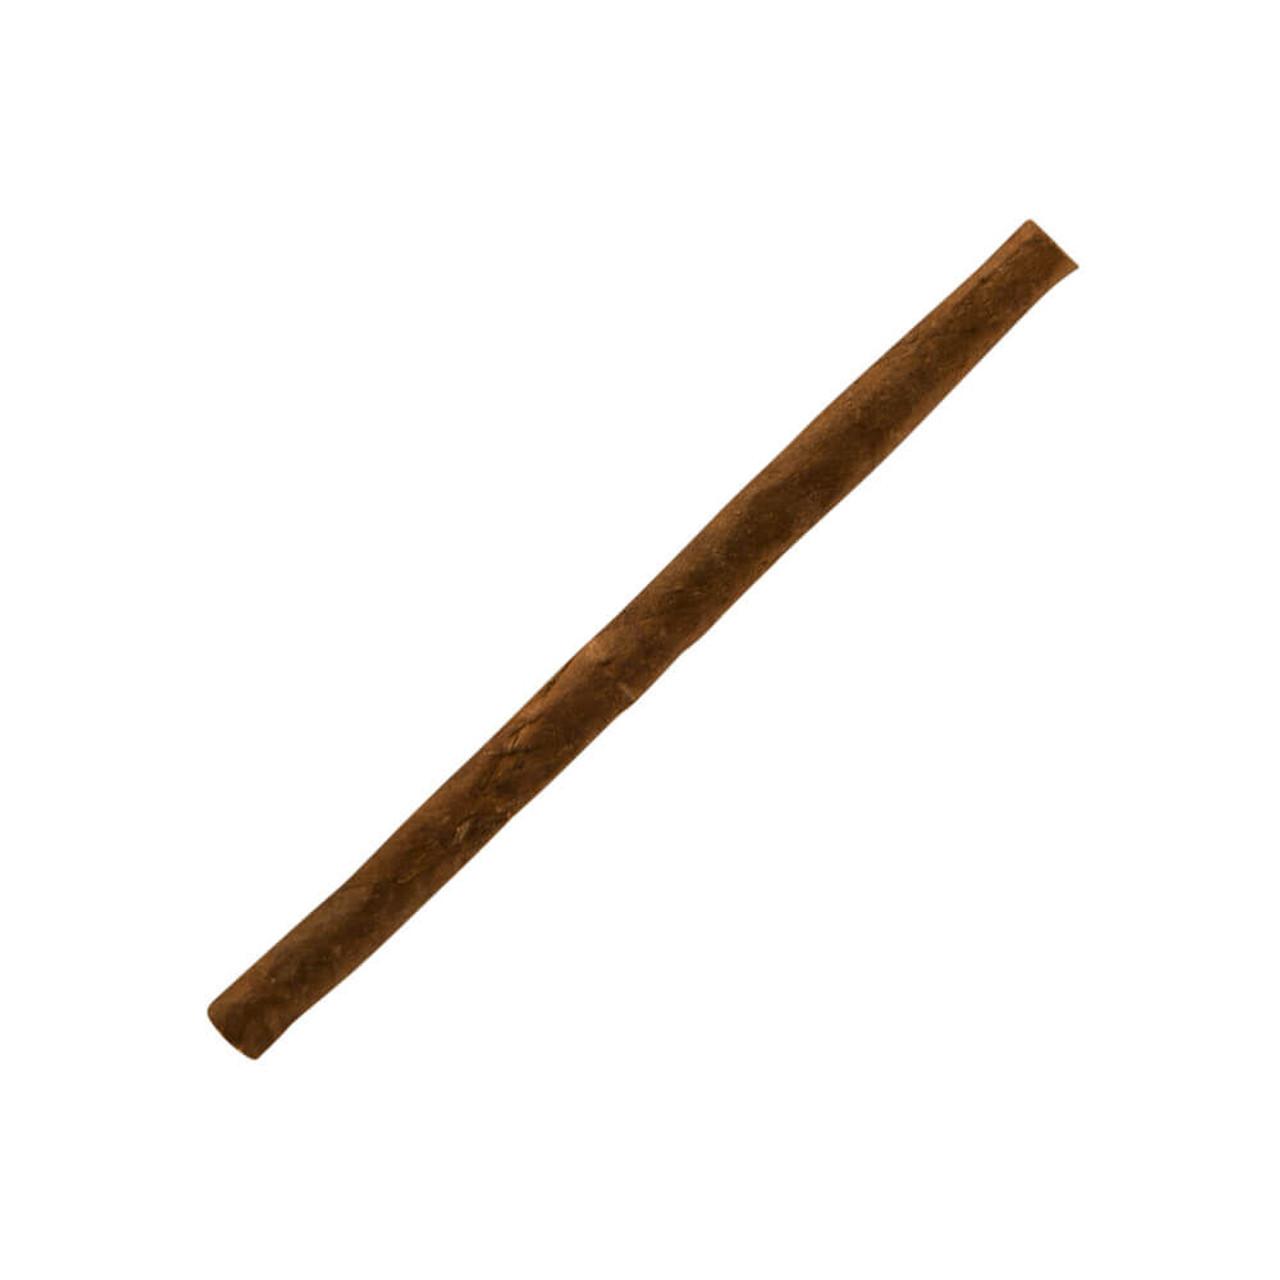 Dutch Delites Swiss Chicos Maduro Cigars - 5 x 30 (Box of 50)